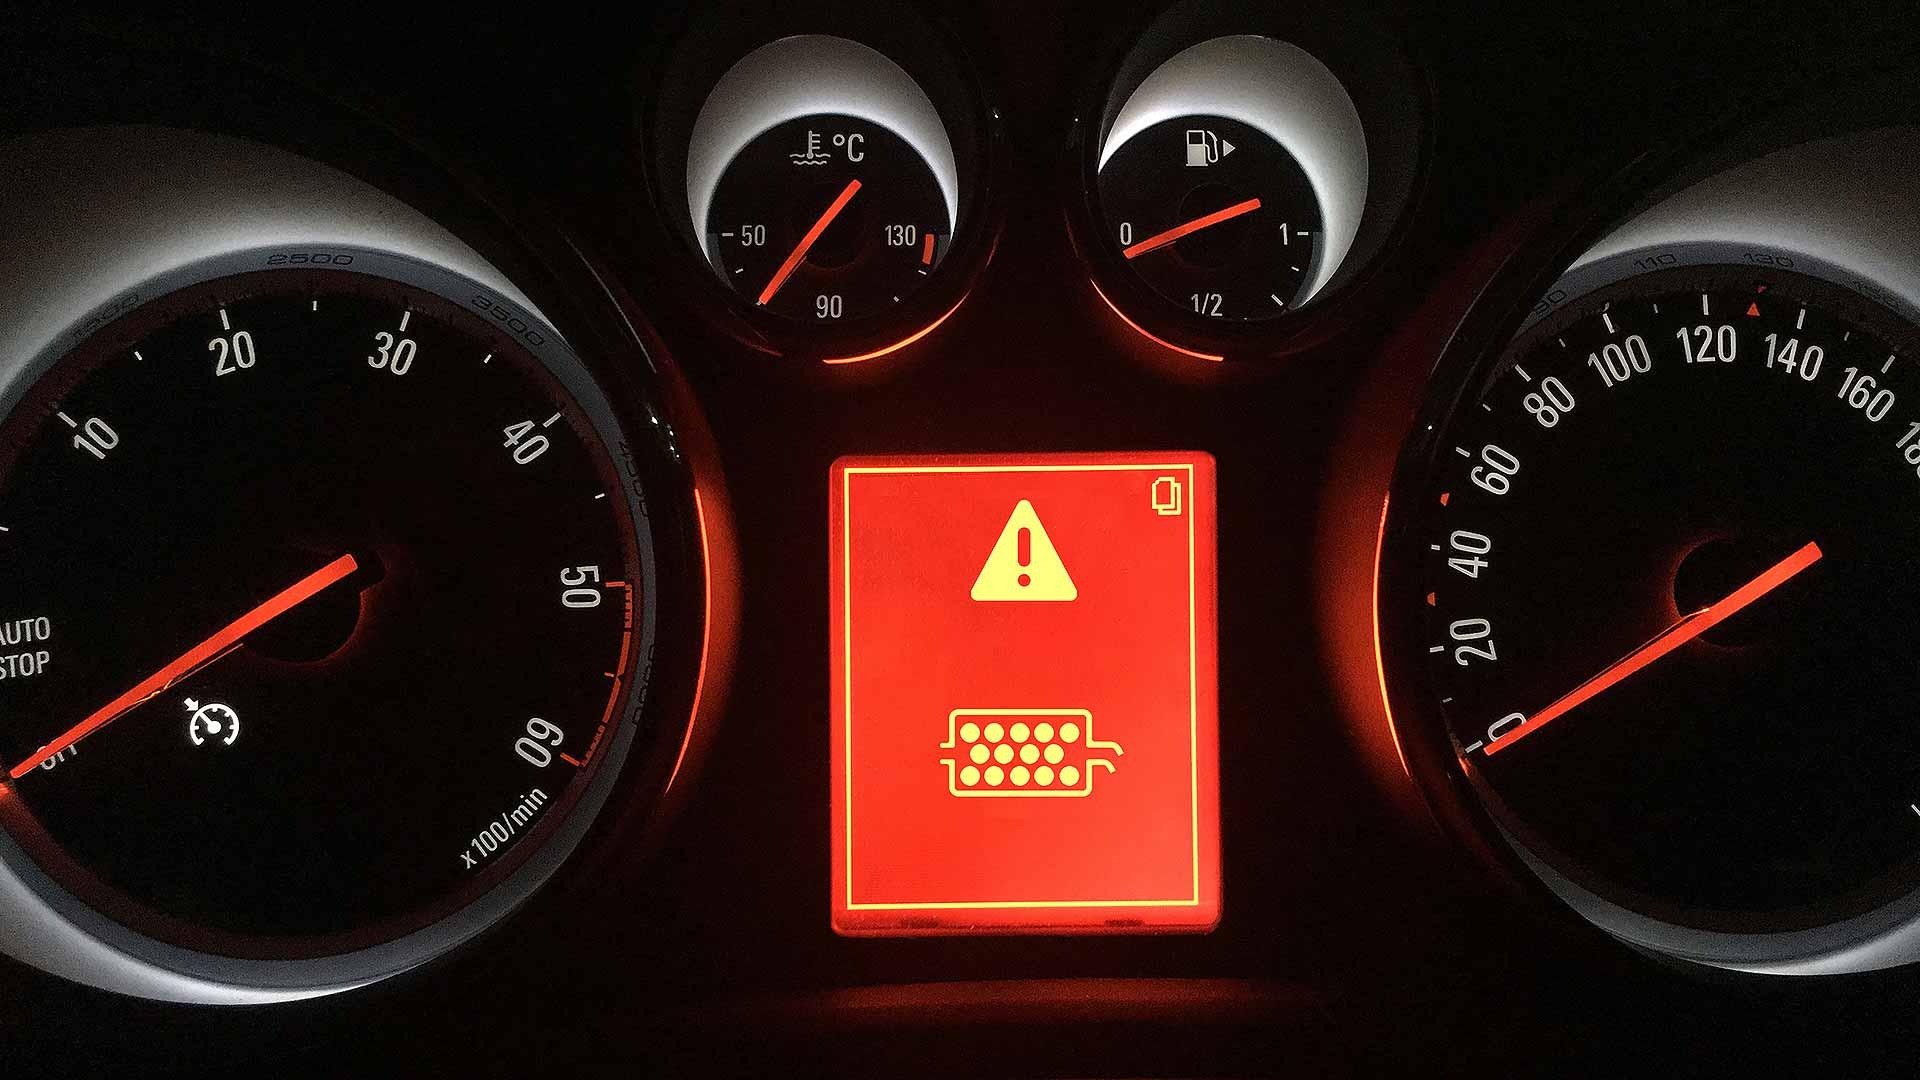 Diesel particulate filter dashboard icon